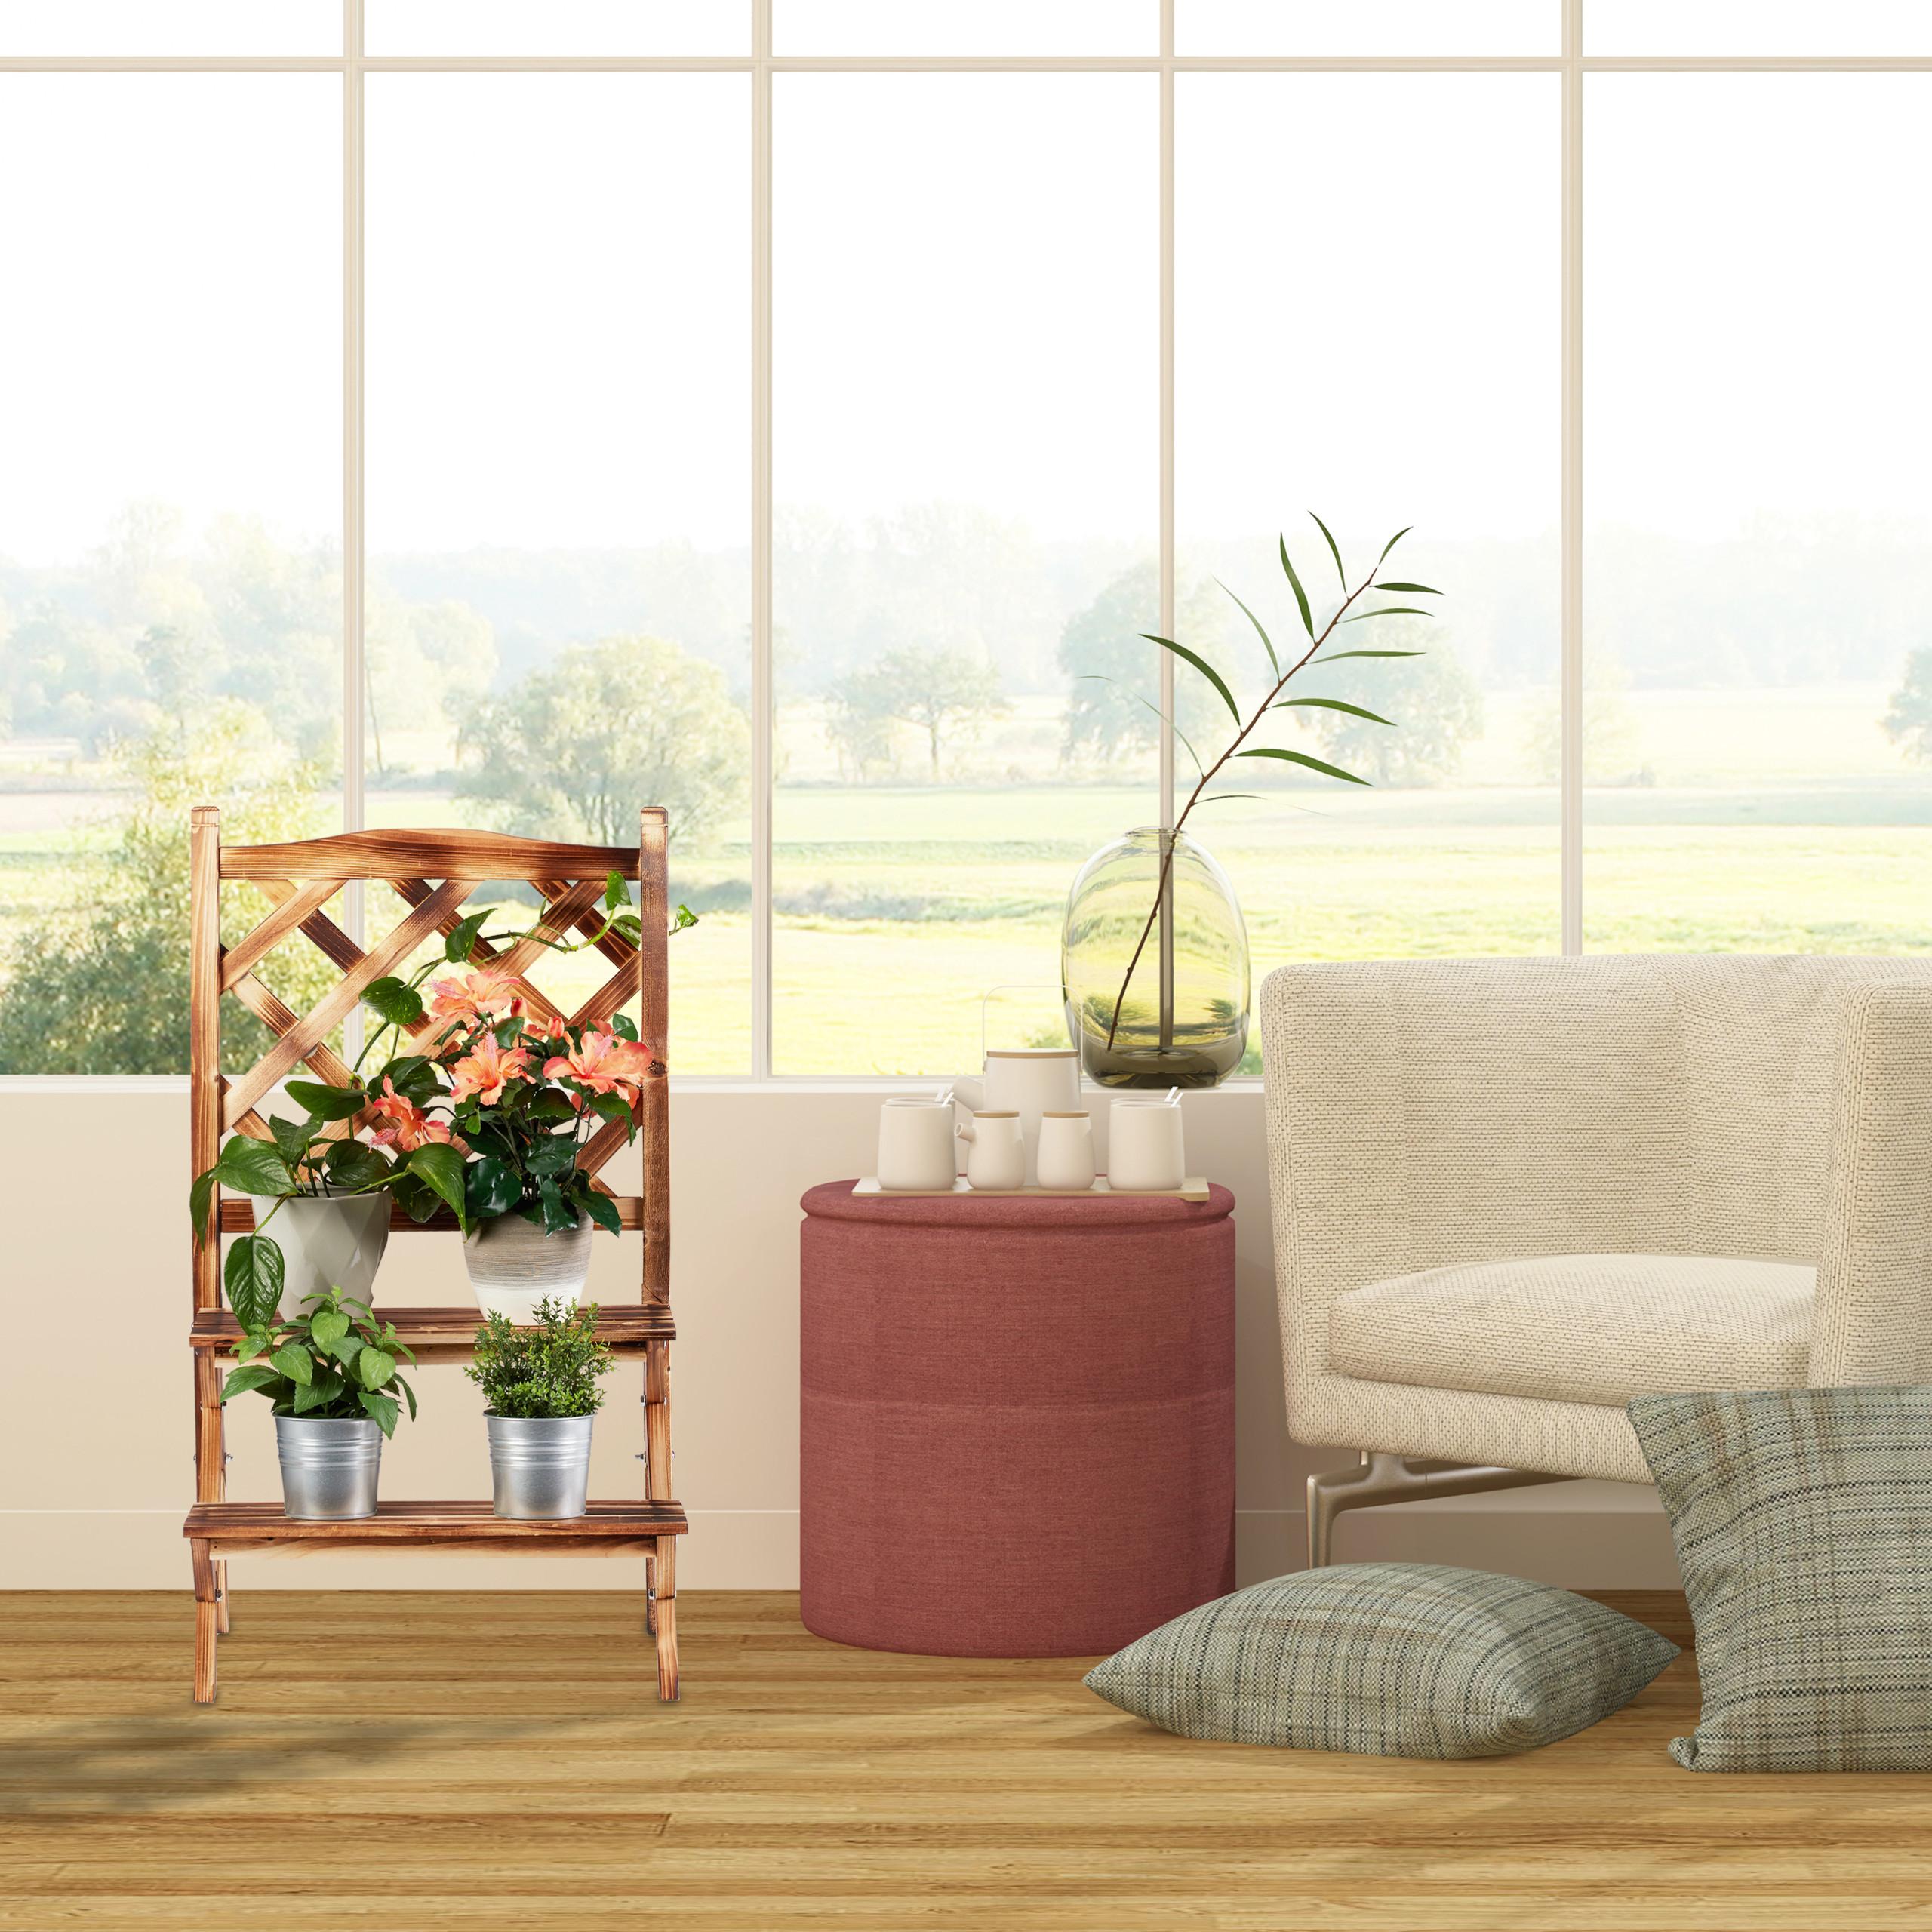 plantenrek-hout-plantentrap-plantenklimrek-bloemenrek-bloementrap miniatuur 14